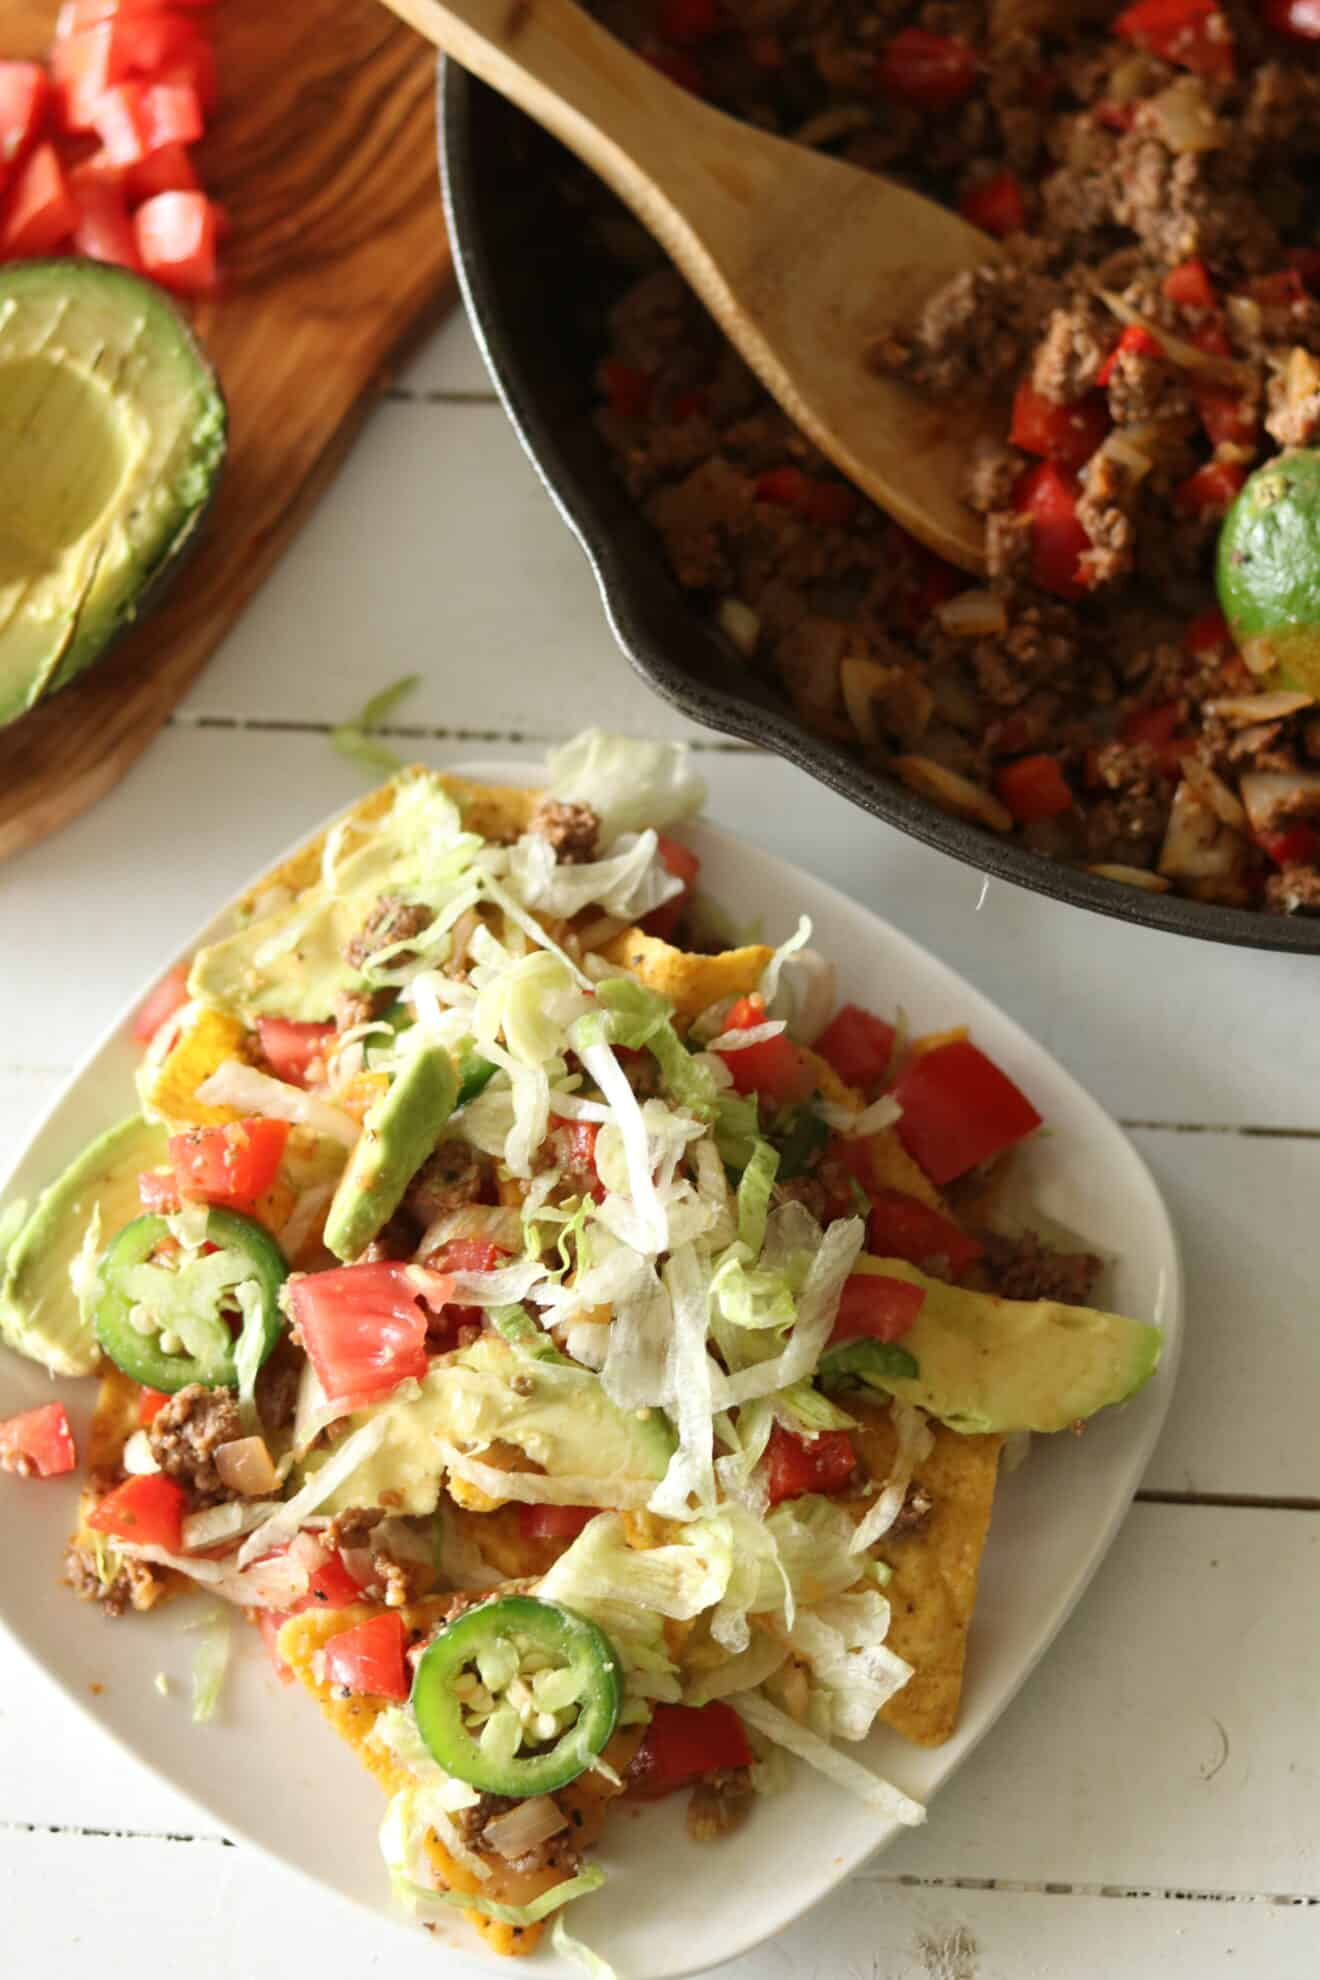 Homemade nachos topped with jalapeños, tomatoes, and avocado.